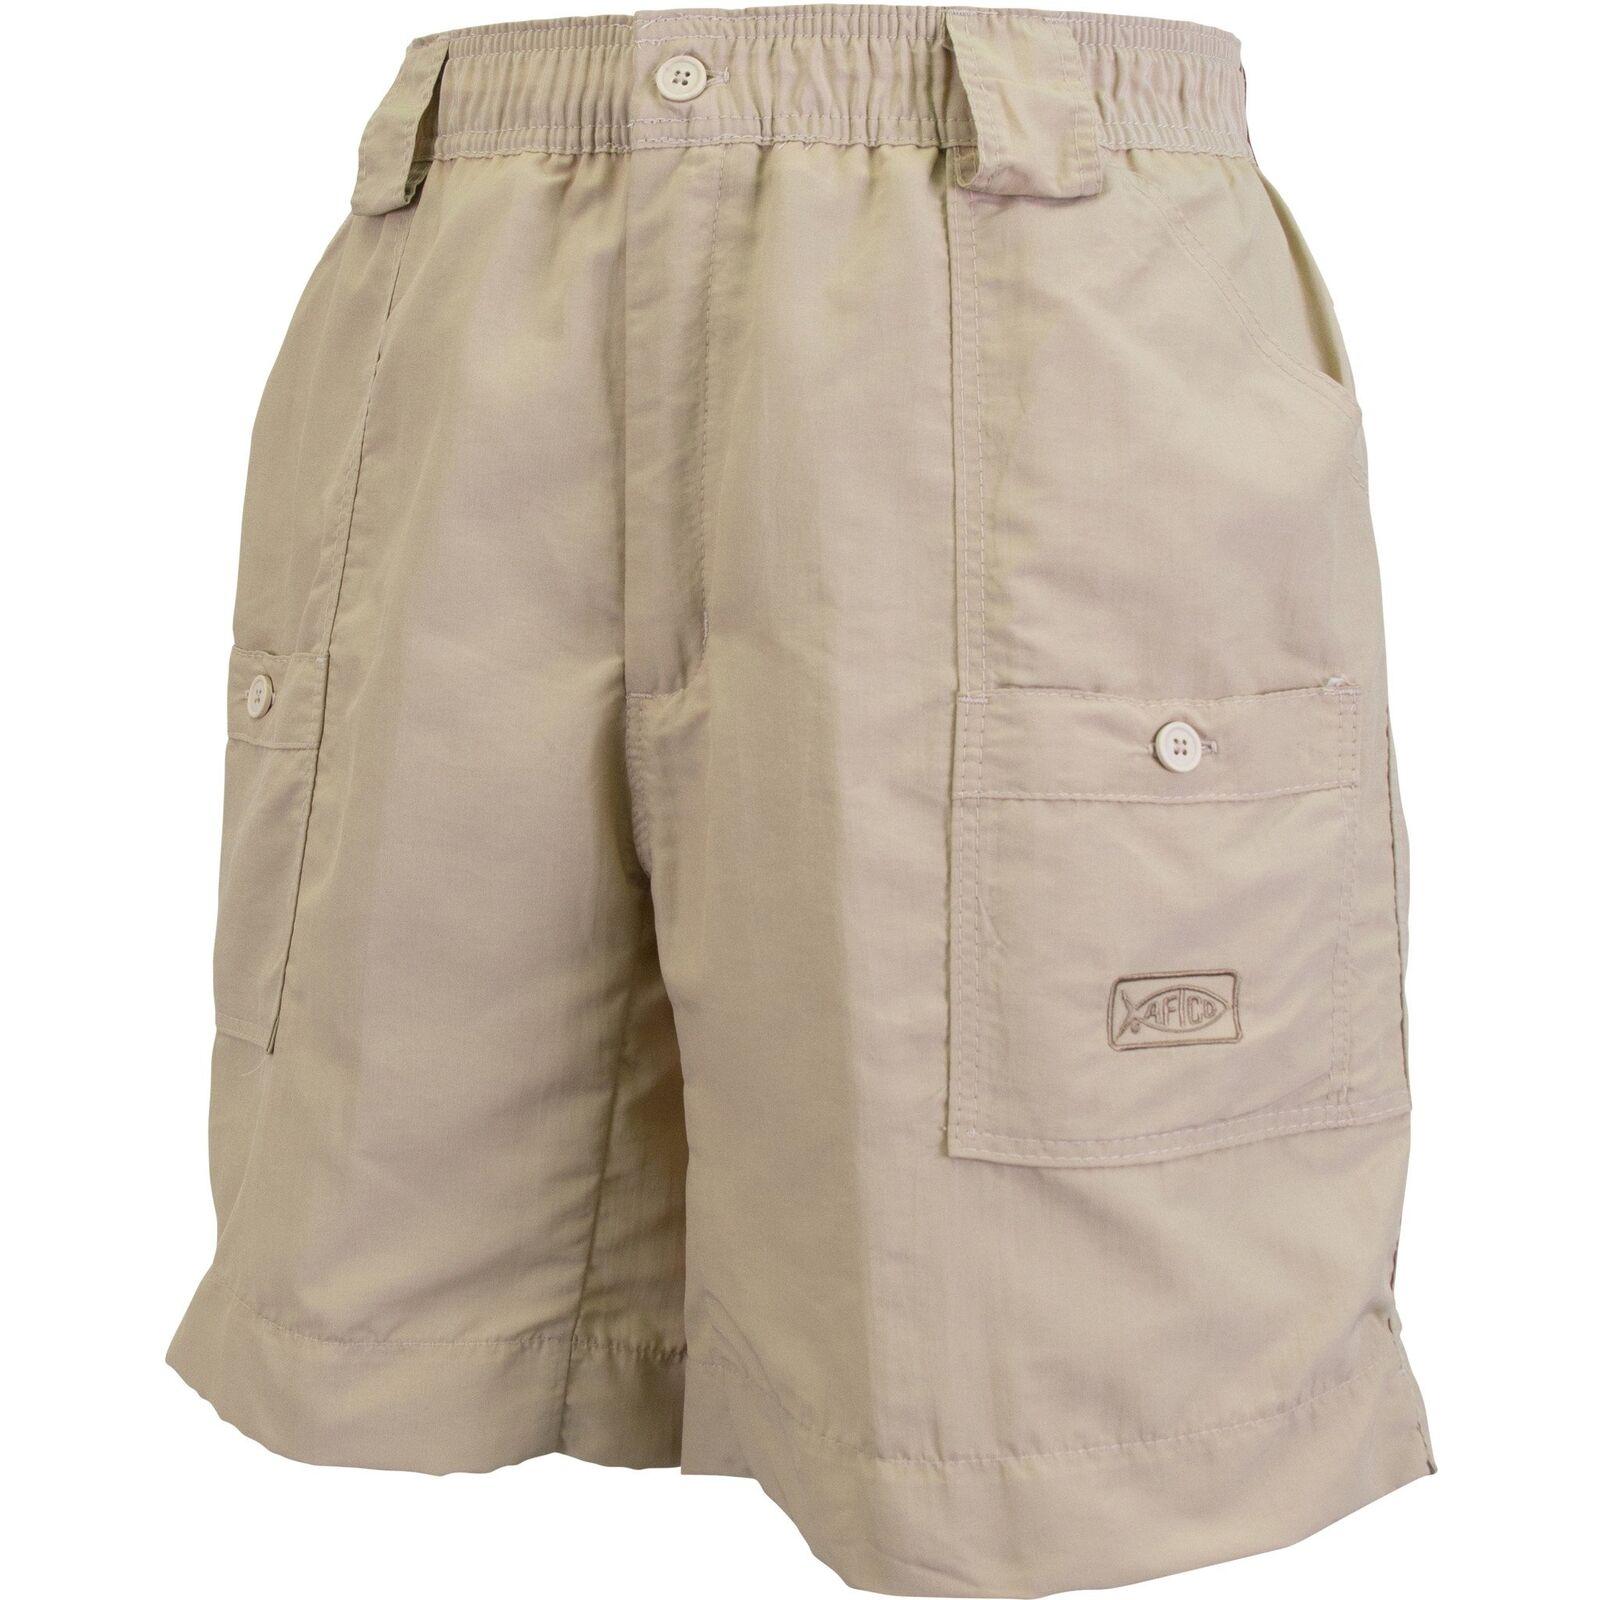 AFTCO M01L Original Long Fishing Shorts - 18  Length- Khaki- Free Ship